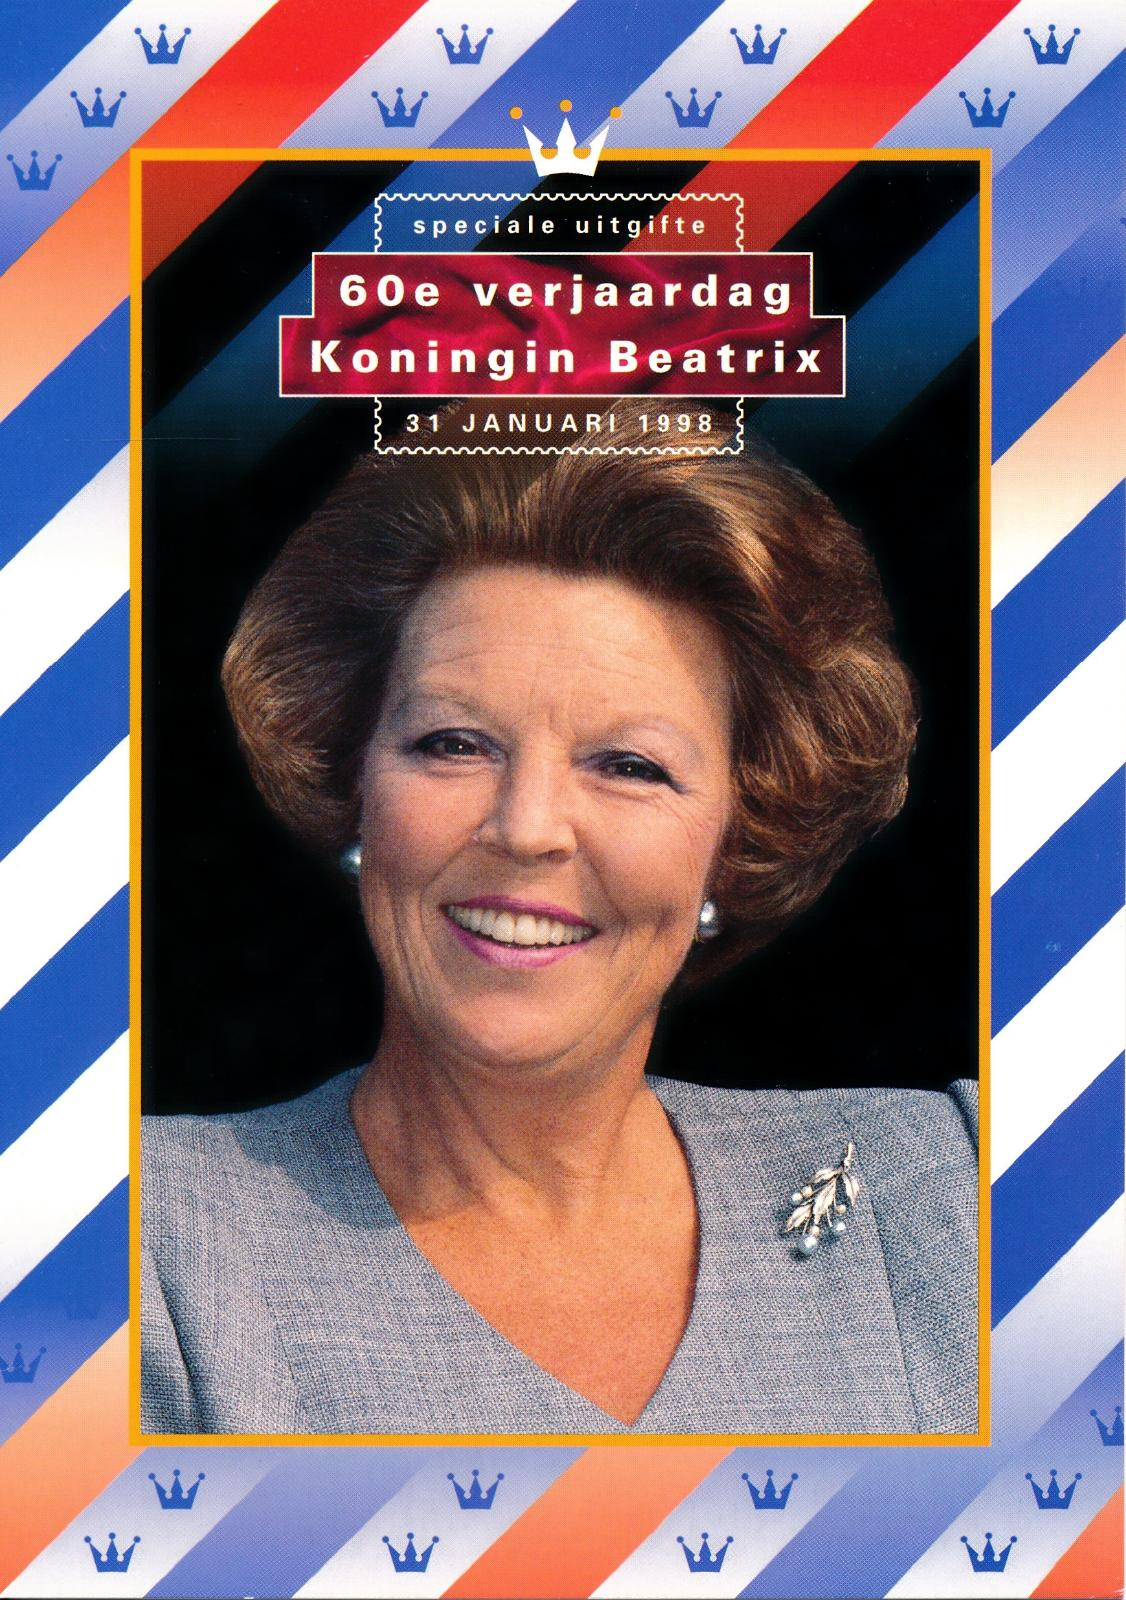 Nederland 1998 Themamapje 60e verjaardag Koningin Beatrix